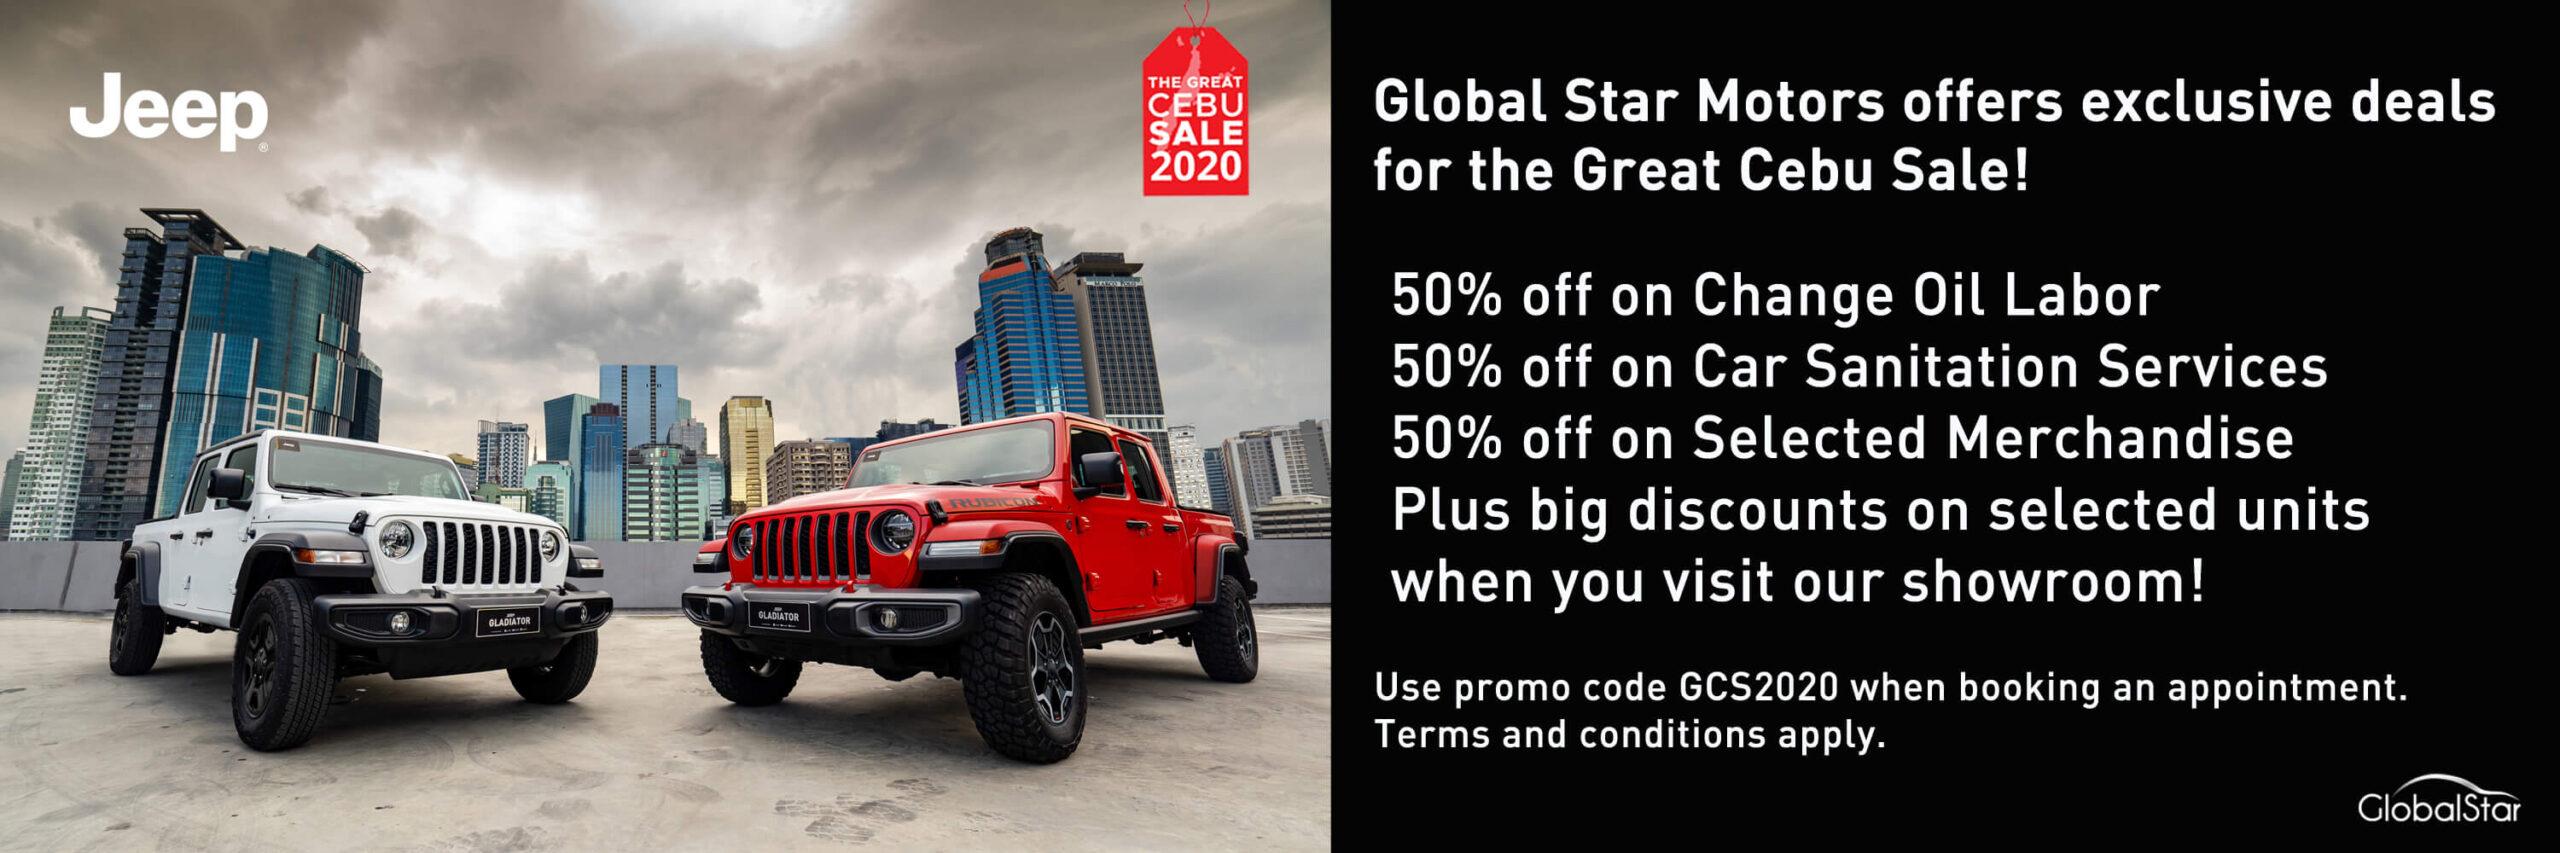 Global Star Motors offers 50% off on change oil labor, car sanitation, selected merchandise